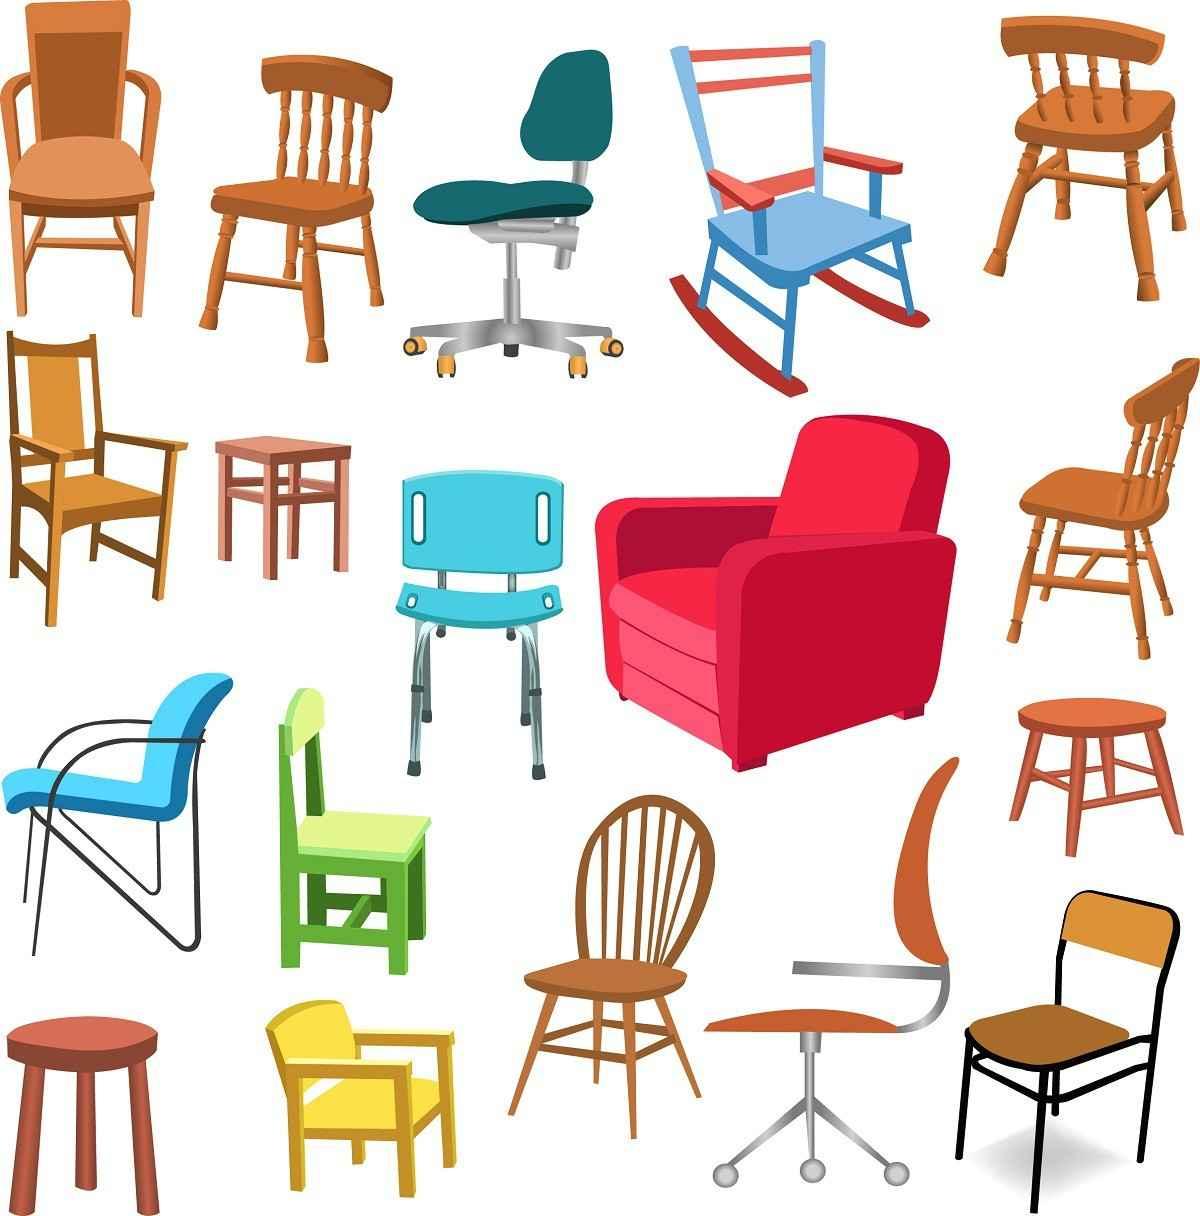 Furniture set 02 png